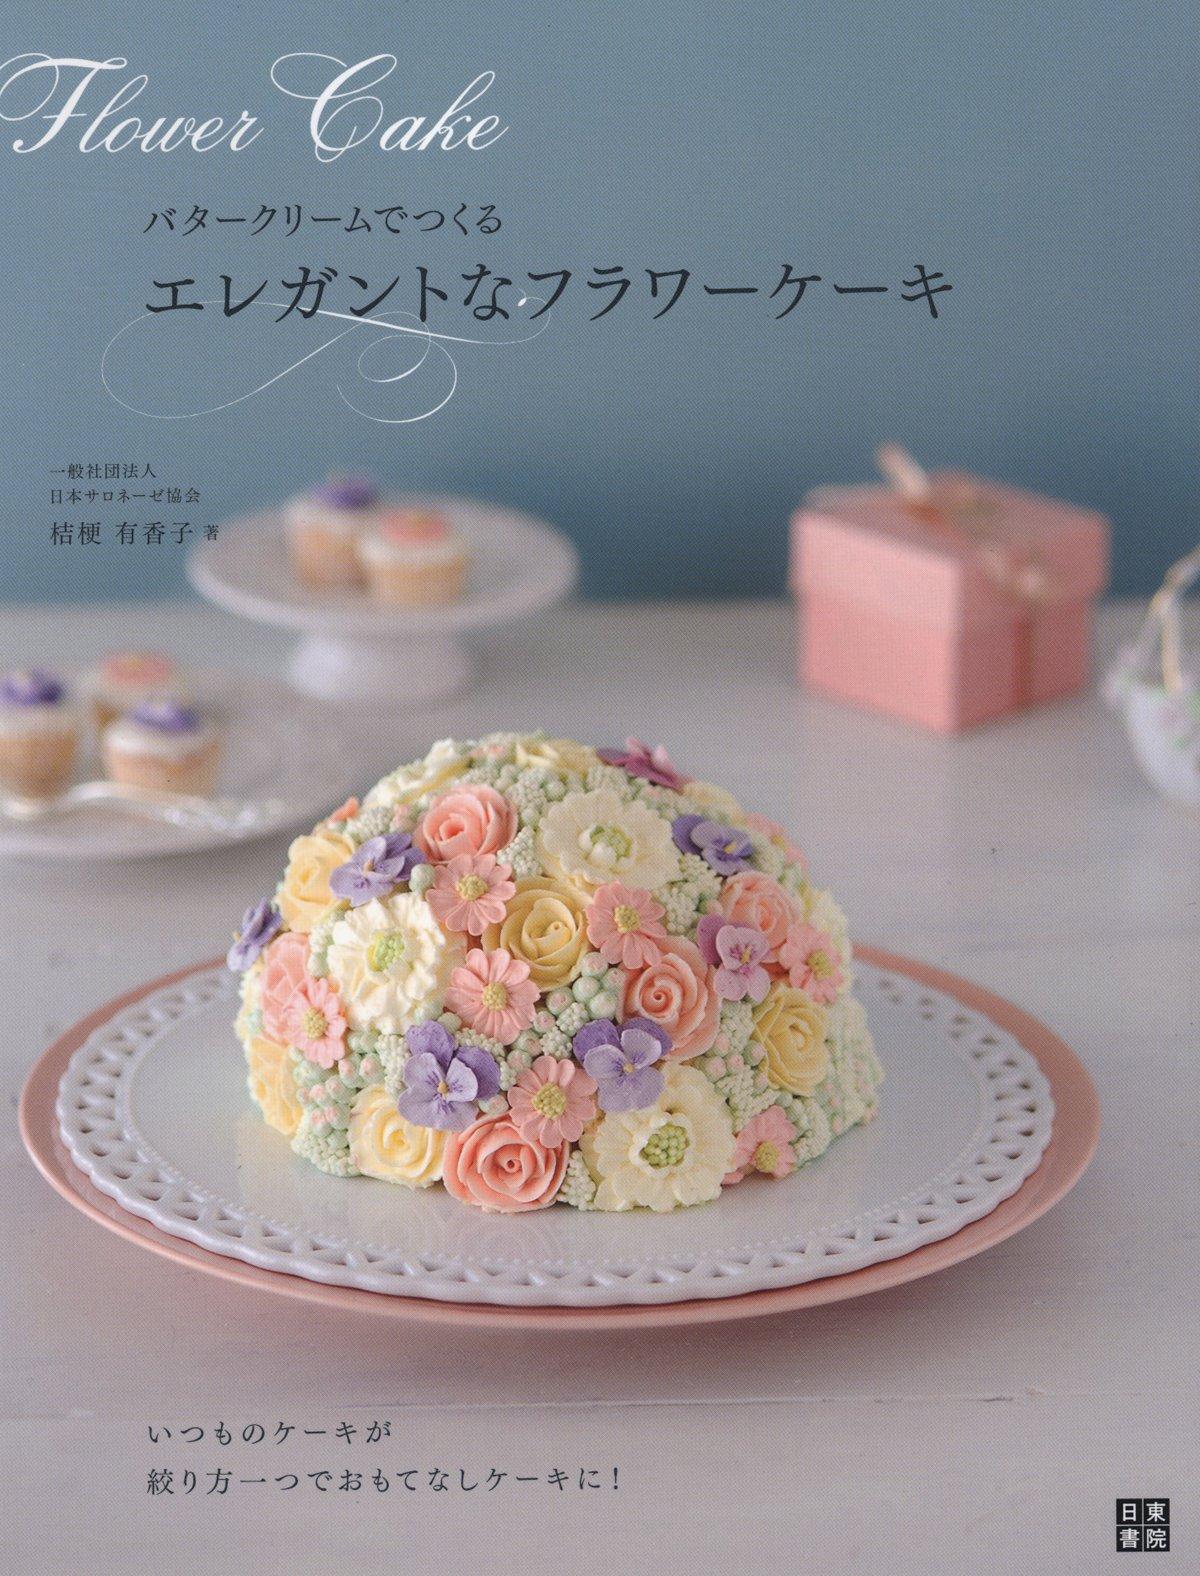 Elegant flower cake made with butter cream